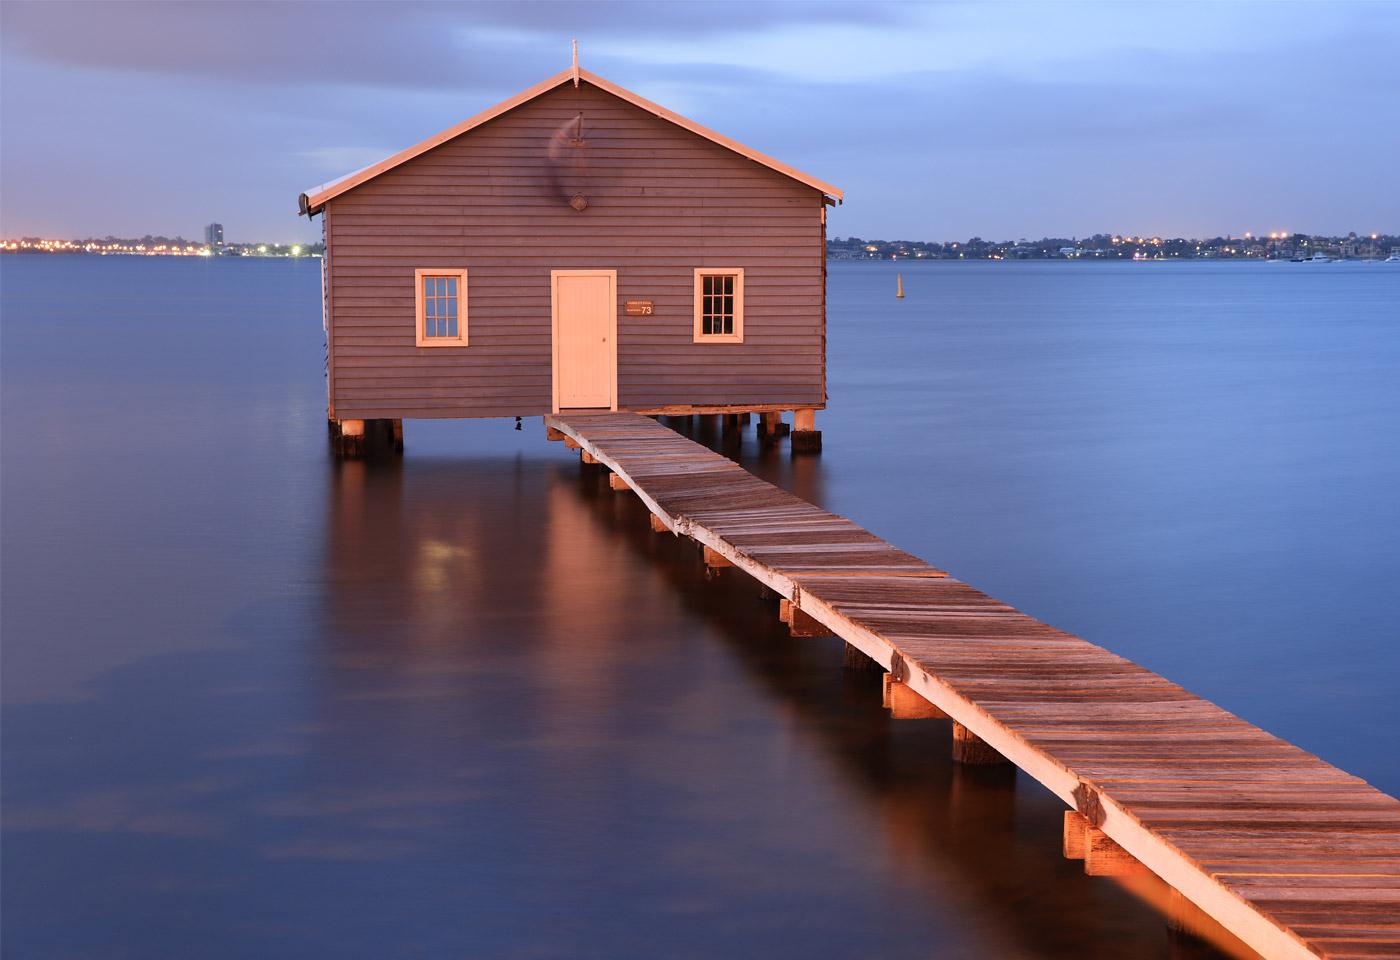 Steve Huddy Boat House